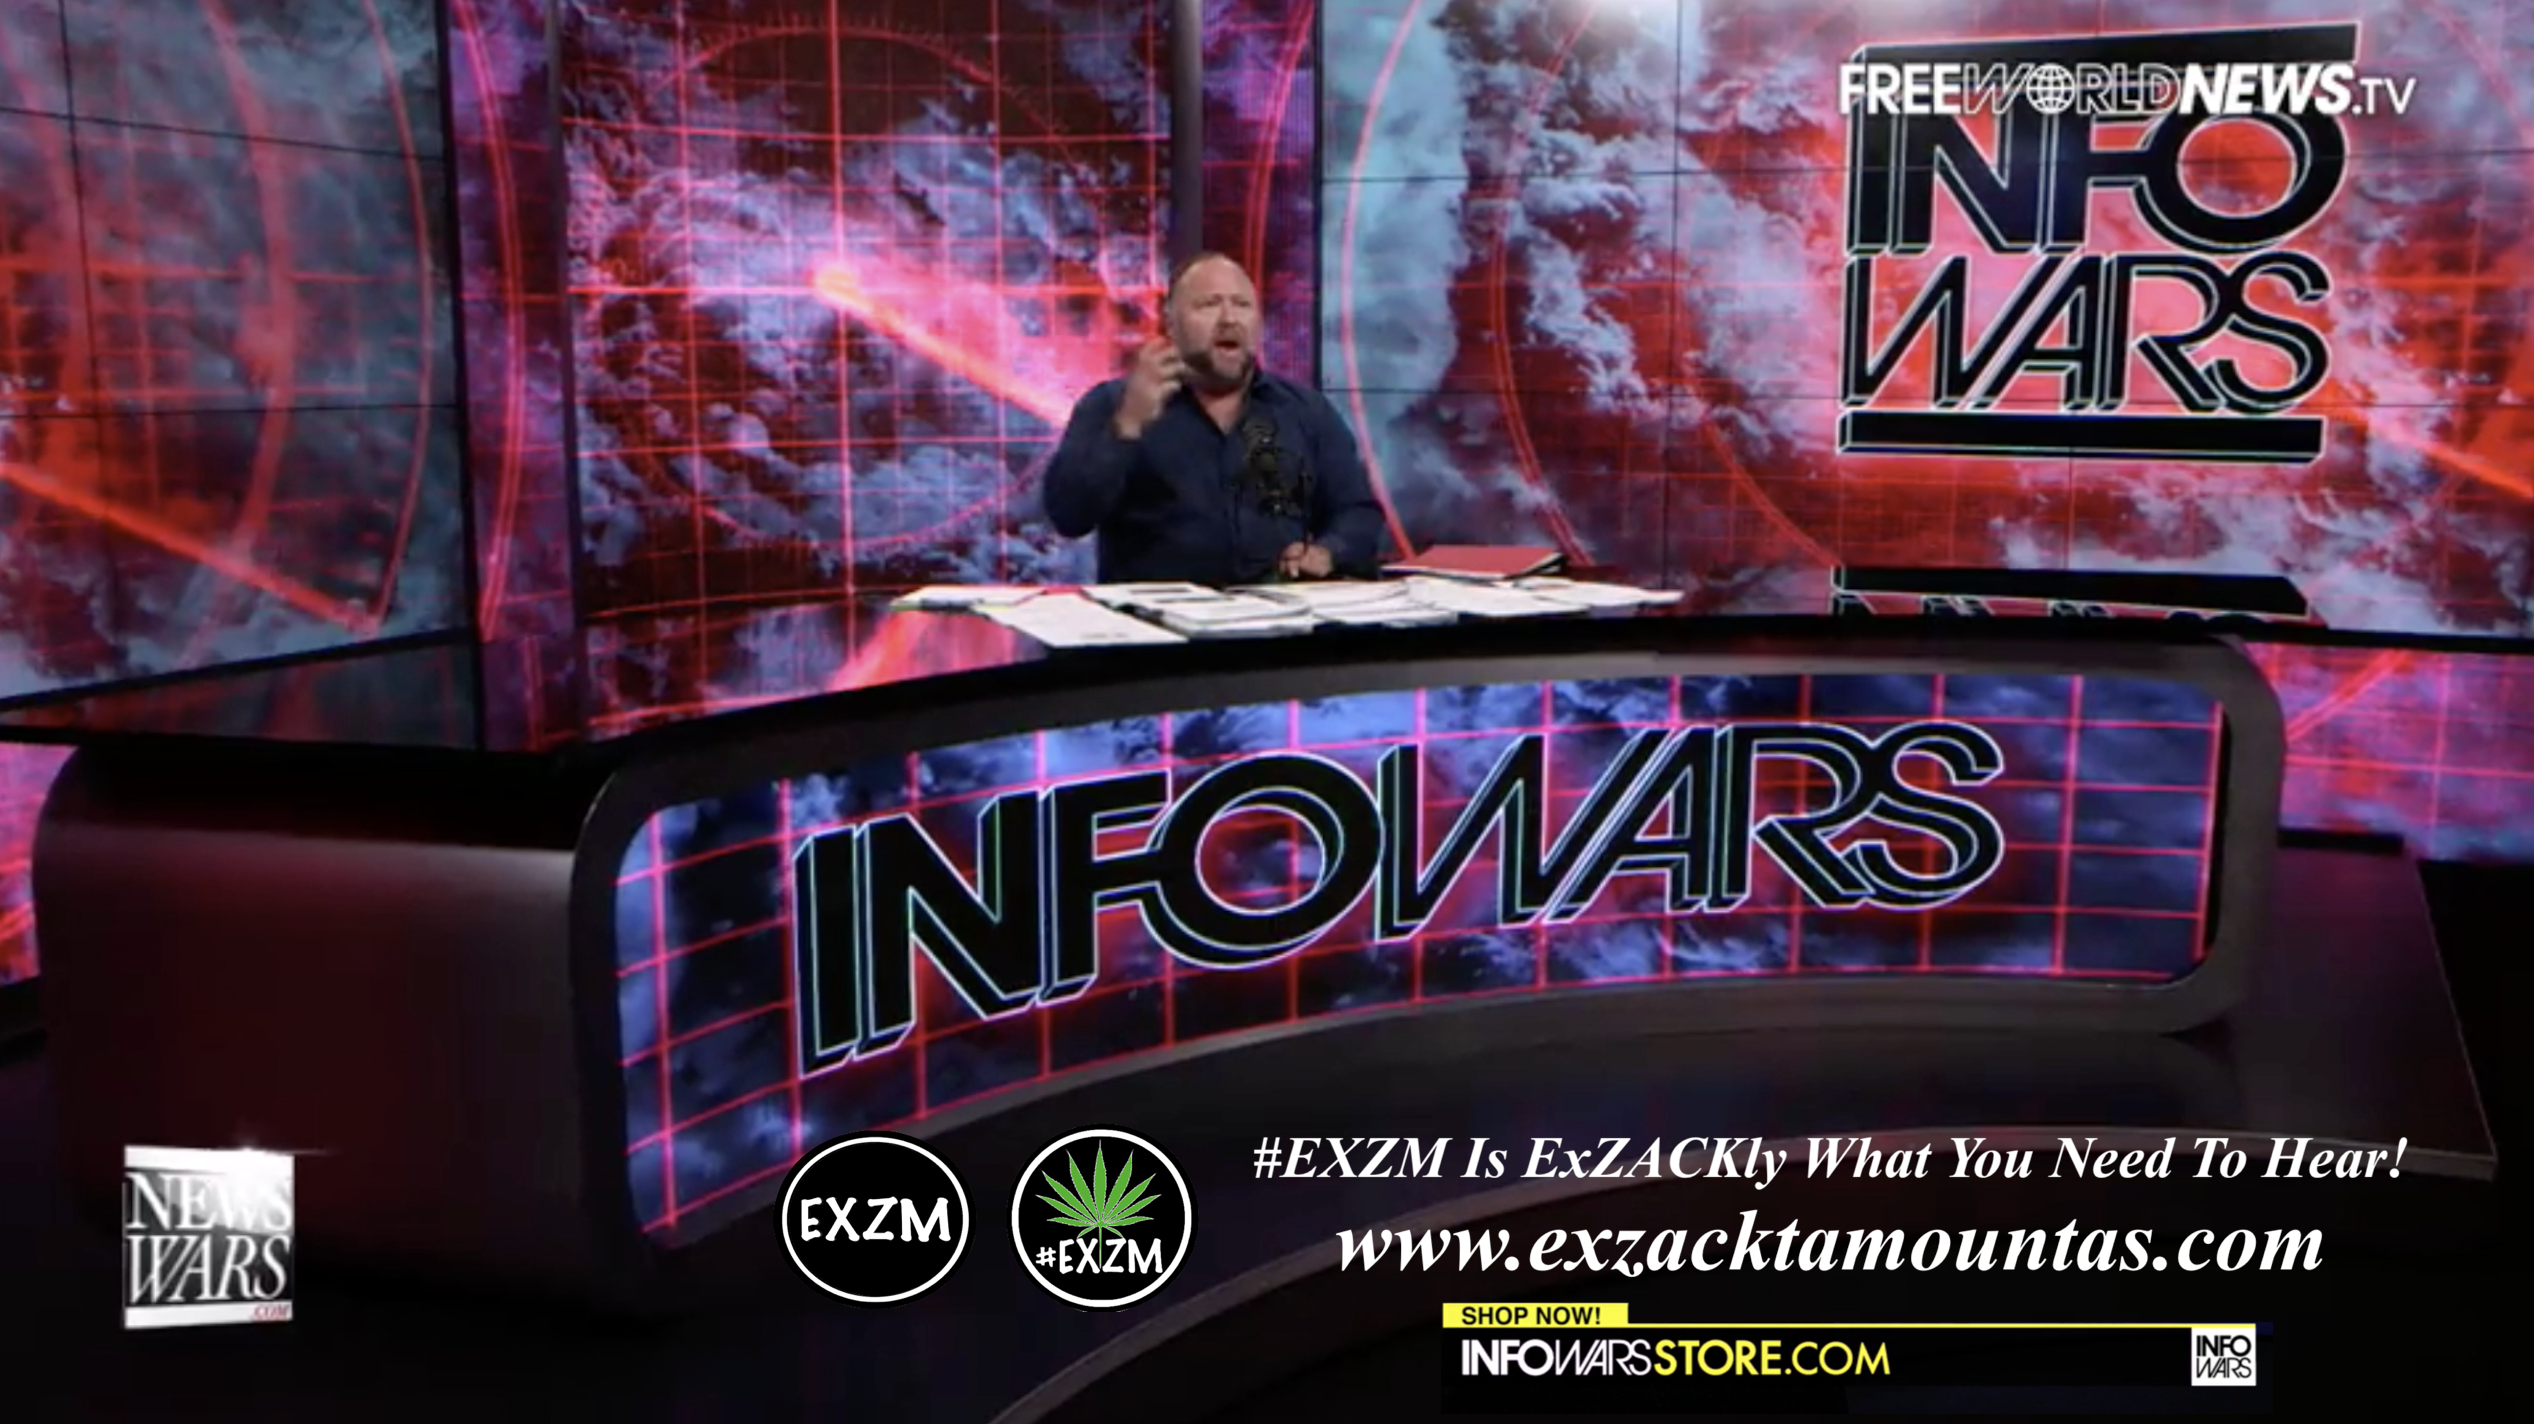 Alex Jones Live In Infowars Studio Free World News TV EXZM Zack Mount June 29th 2021 copy